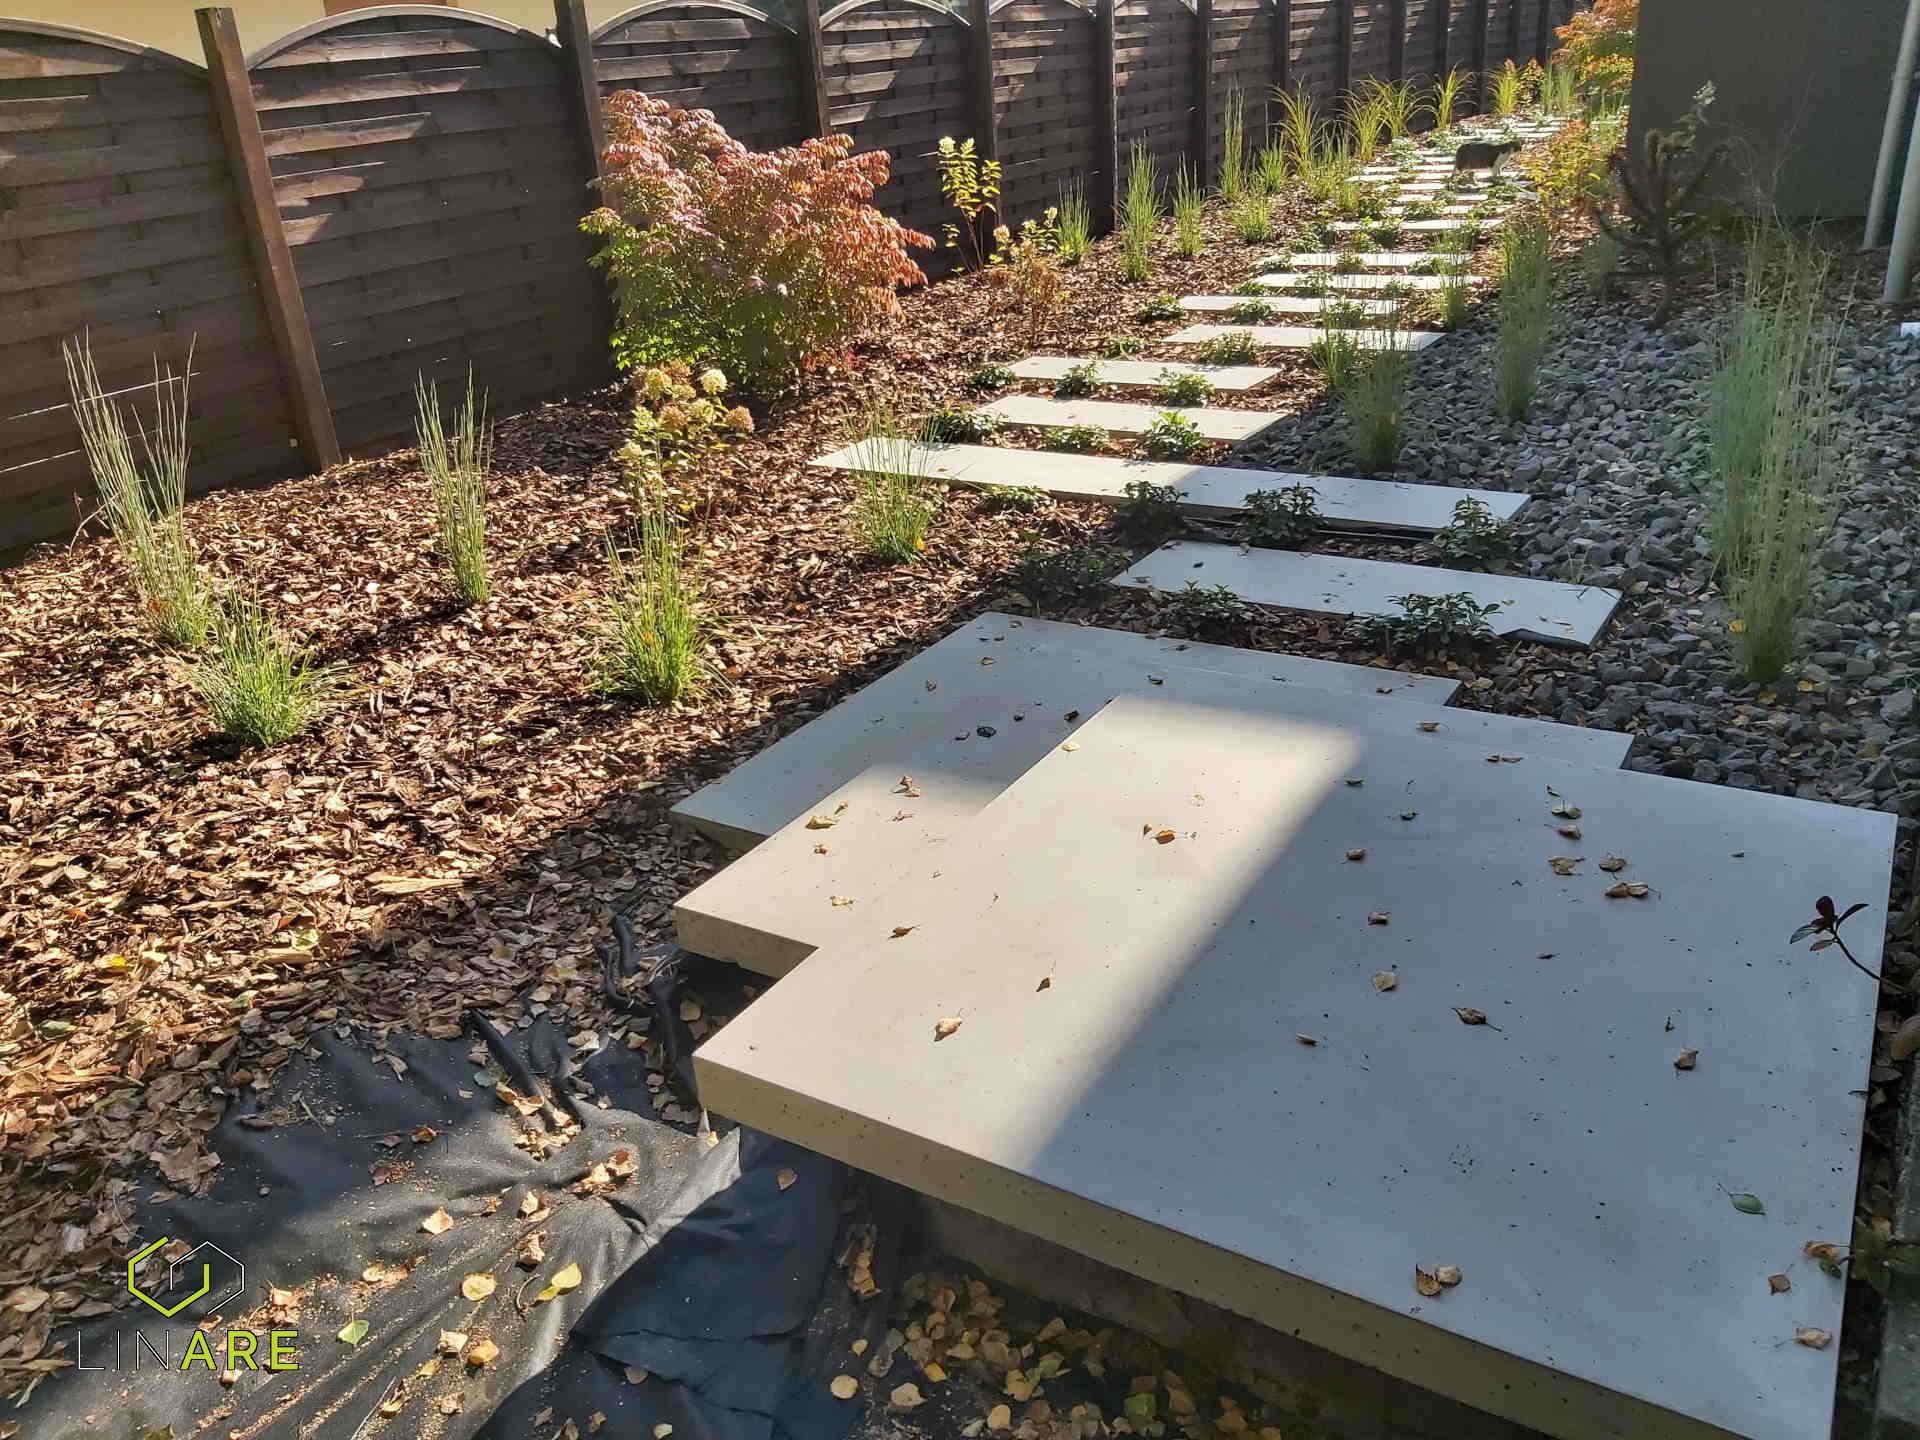 płyta betonowa tarasowa